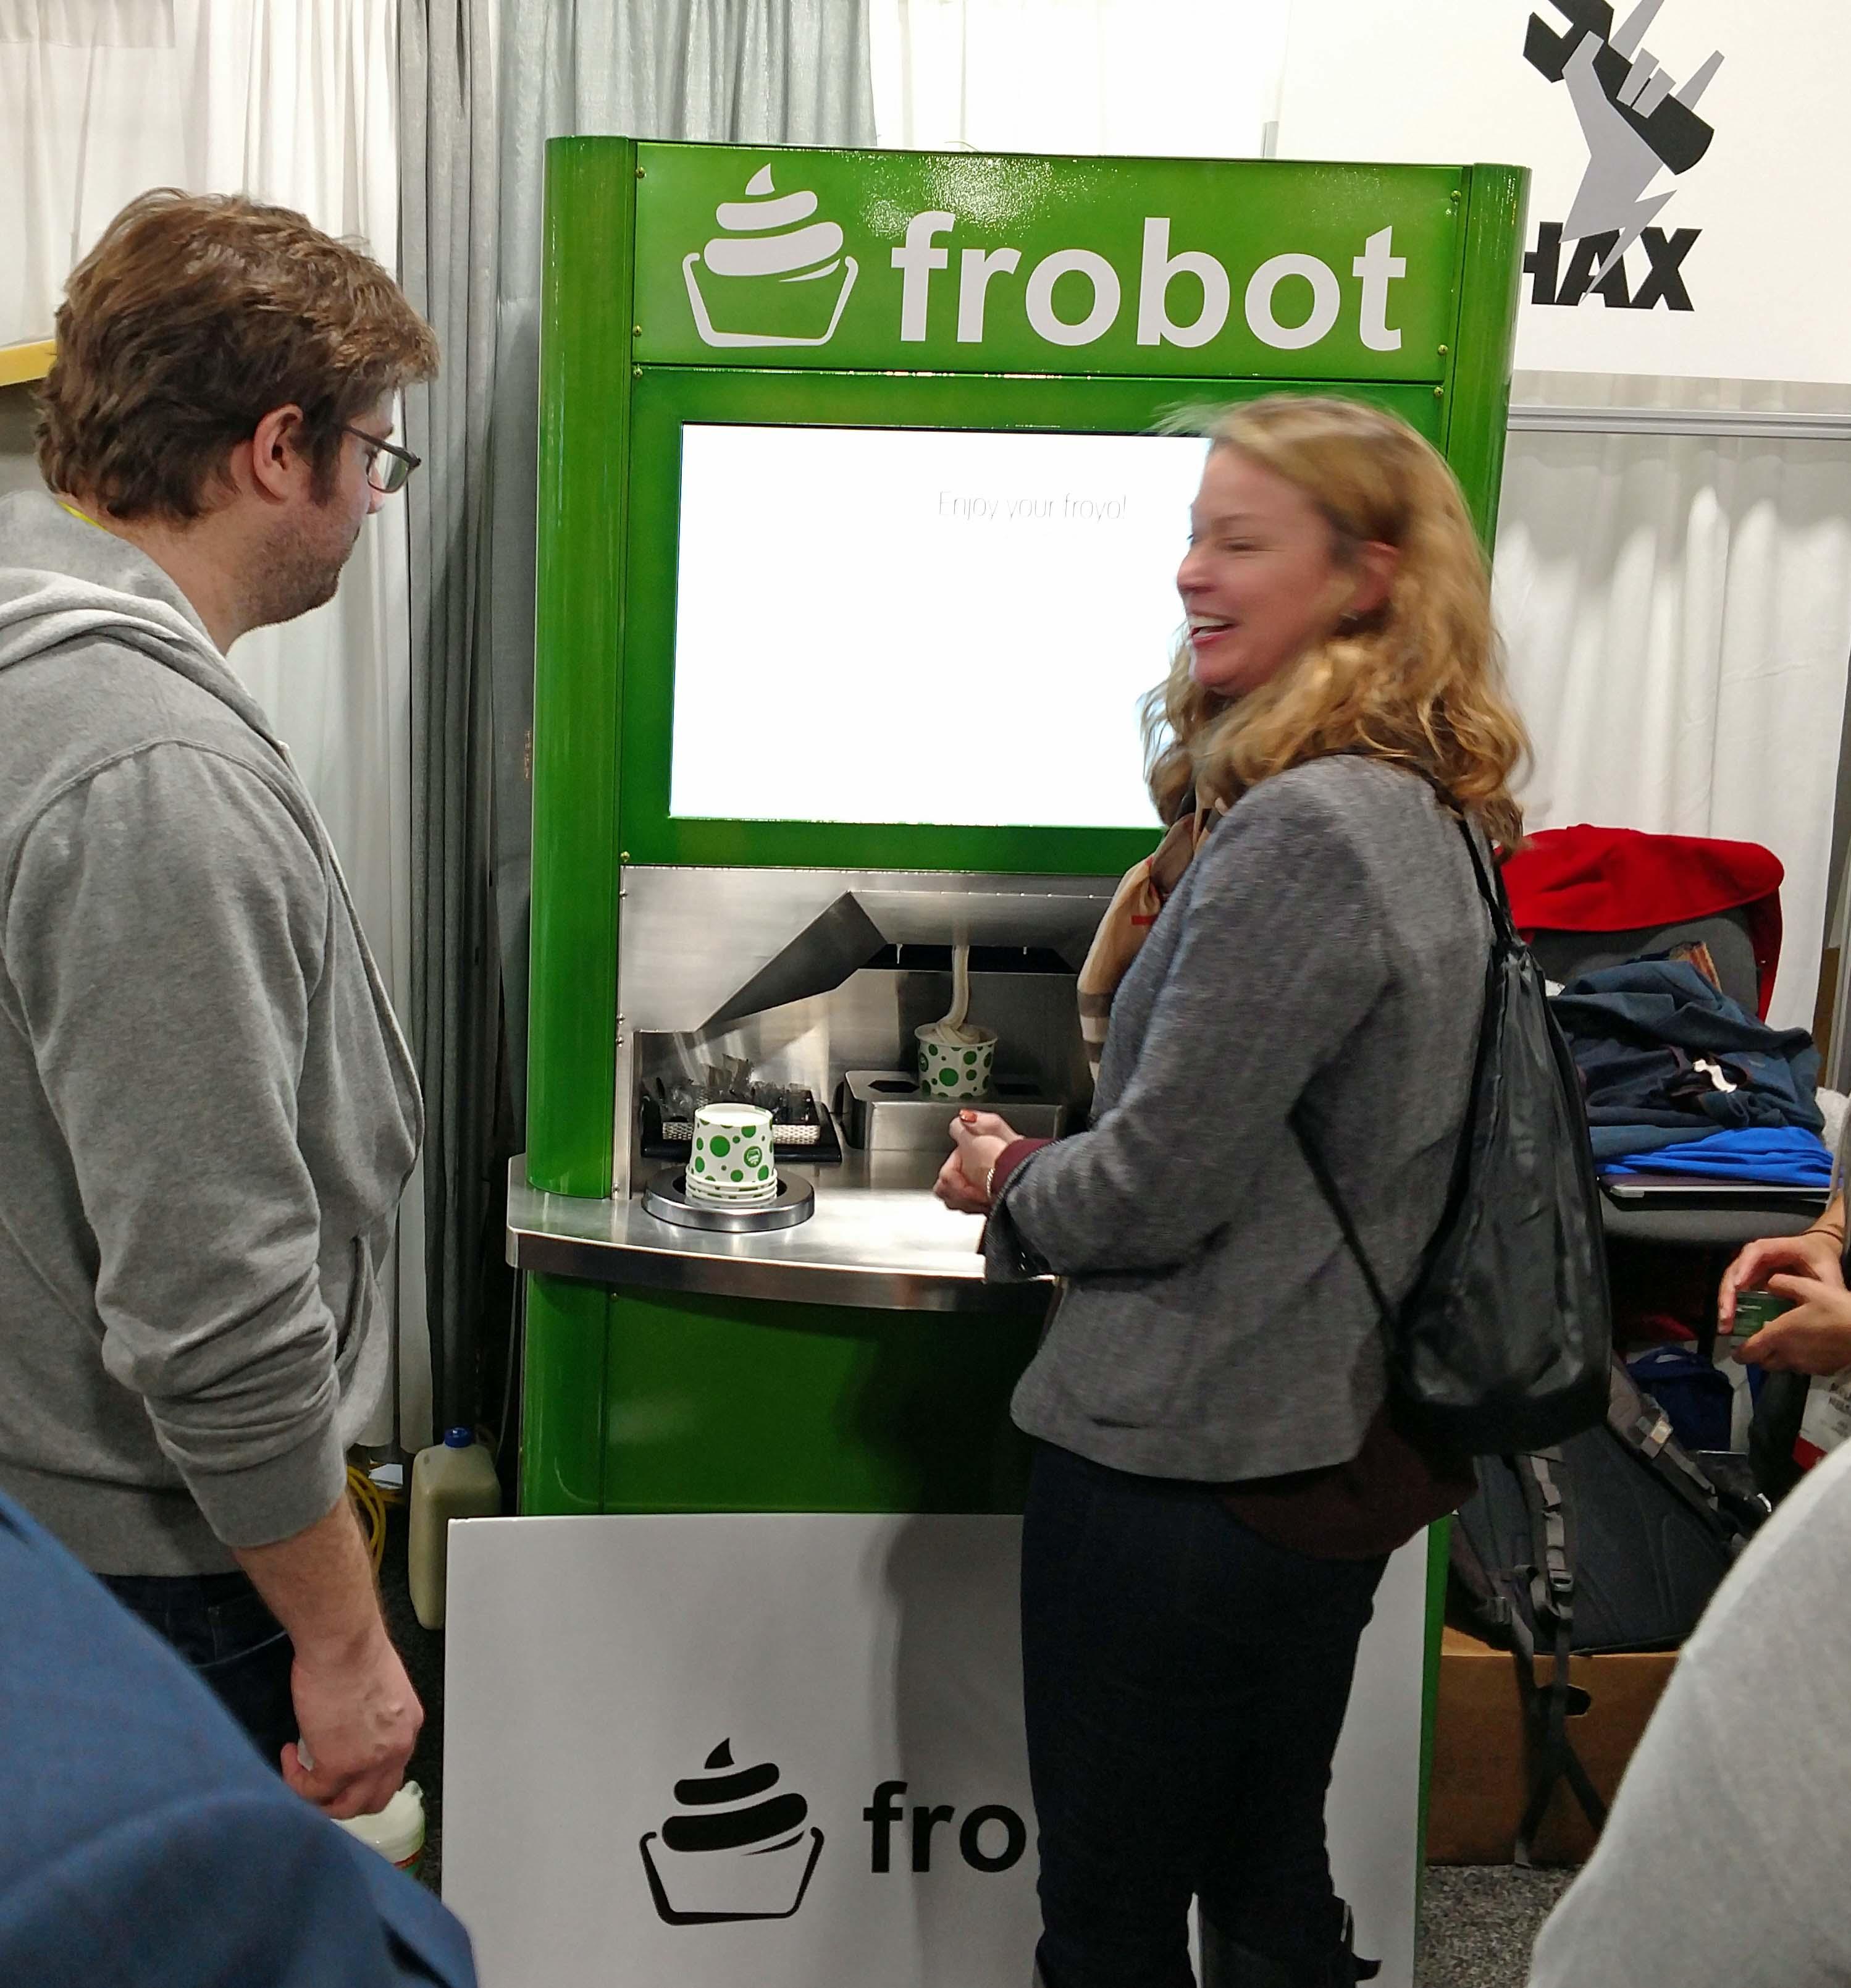 13FroBot